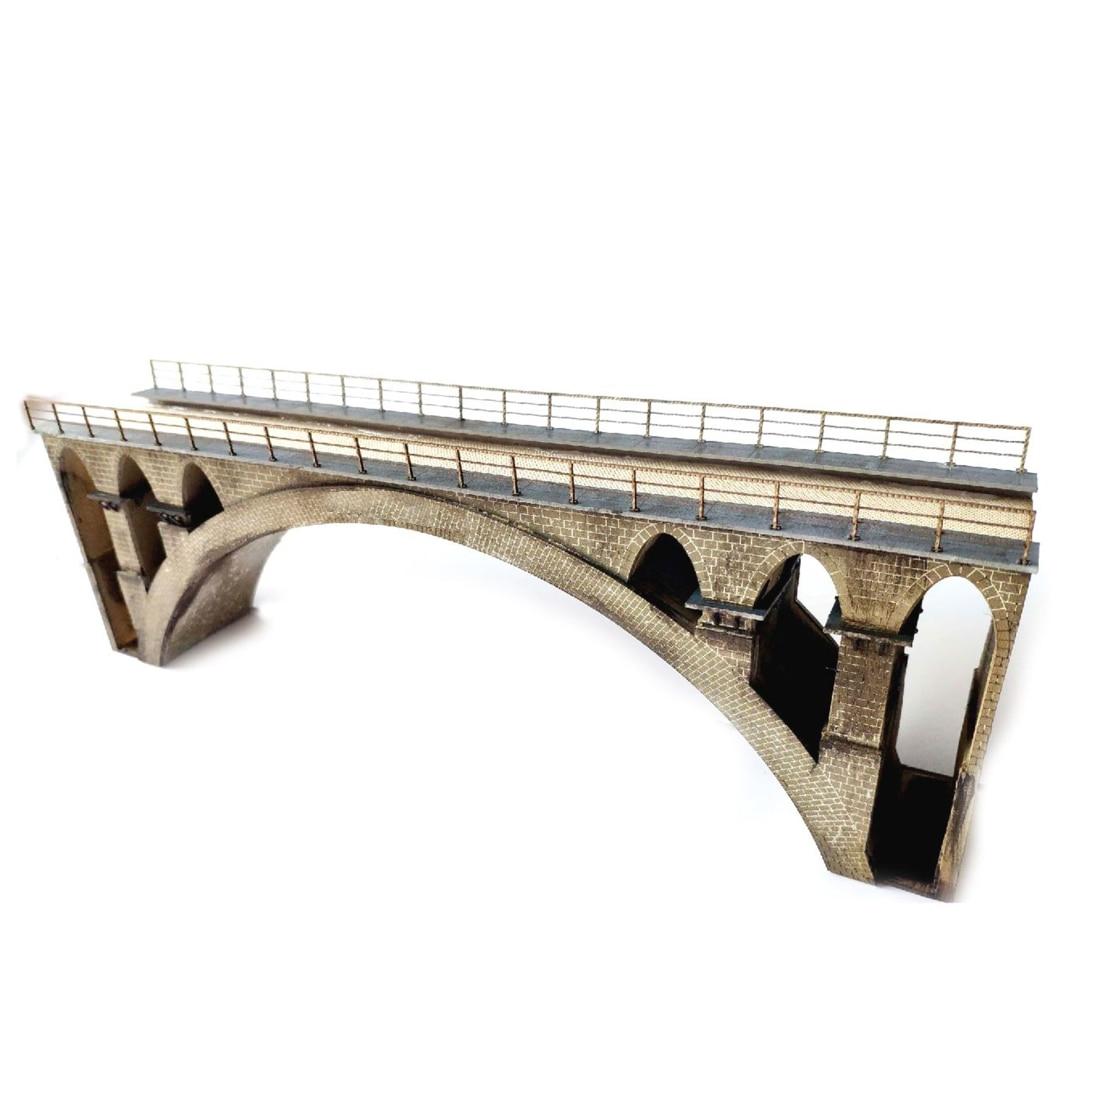 35cm 1:87 HO Scale Train Railway Scene Decoration T41 First-line Bridge Assembly Kit Model For Sand Table